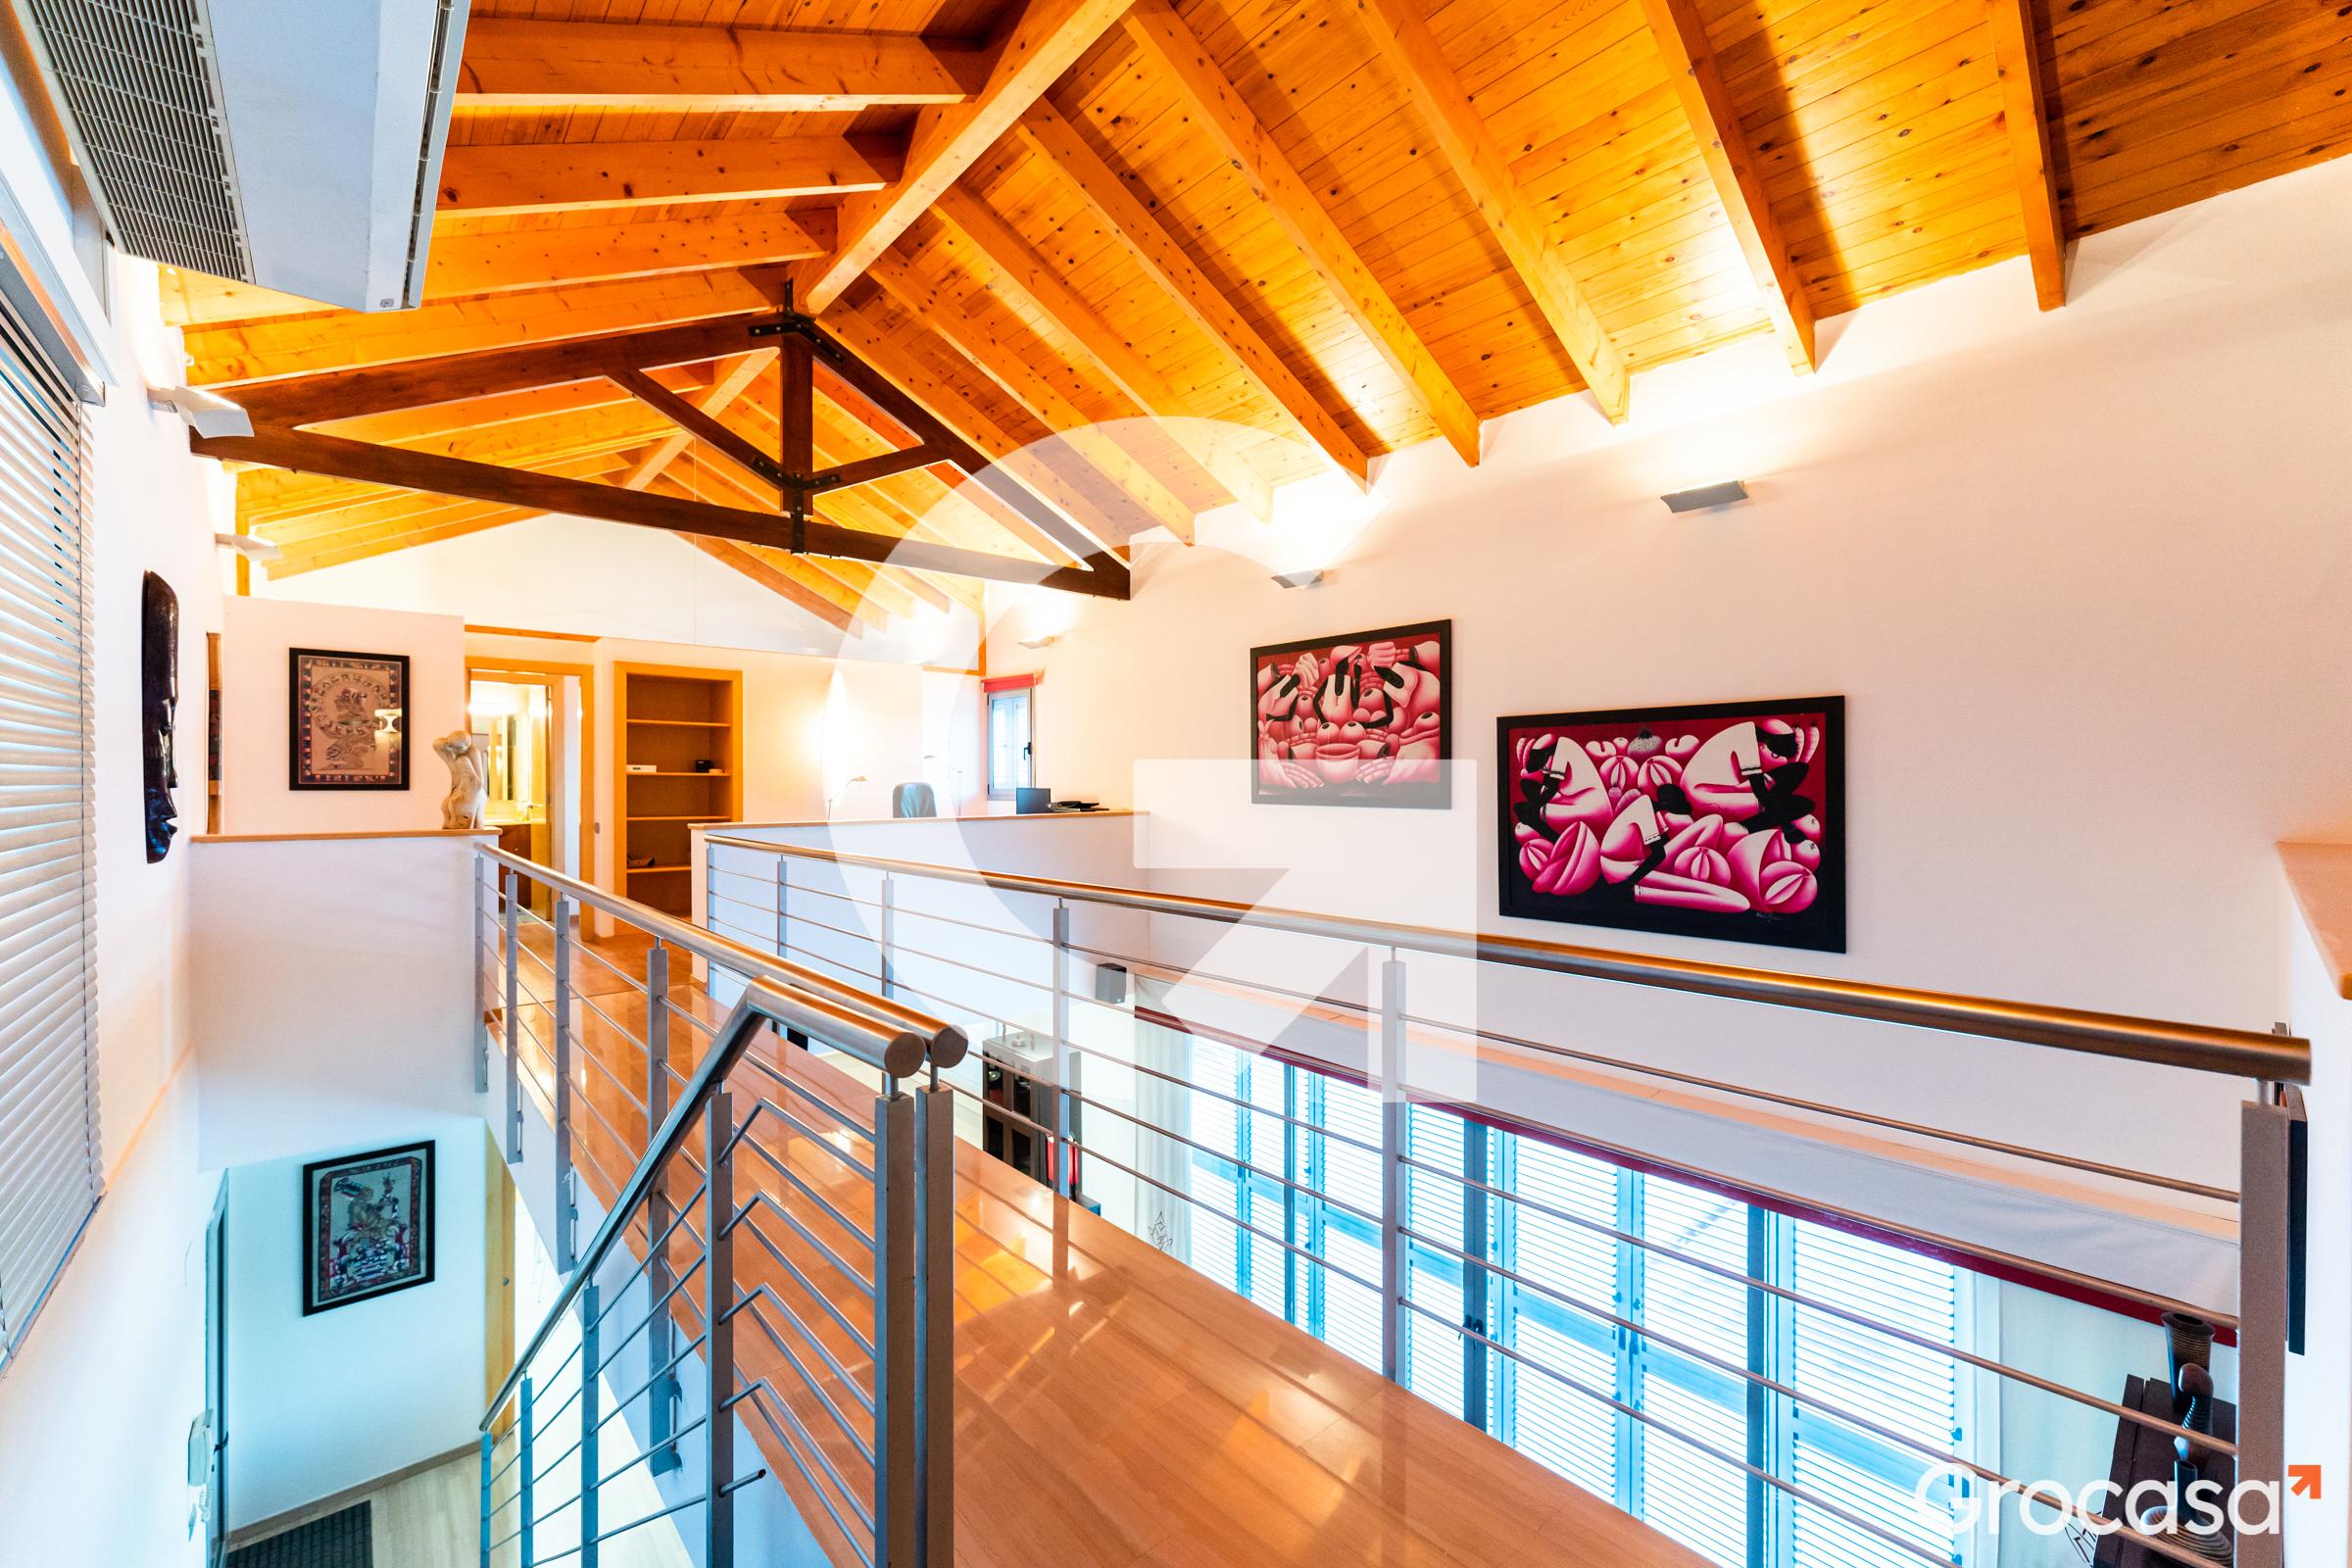 Casa en Selva negra en VALLIRANA en Venta por 465.000€